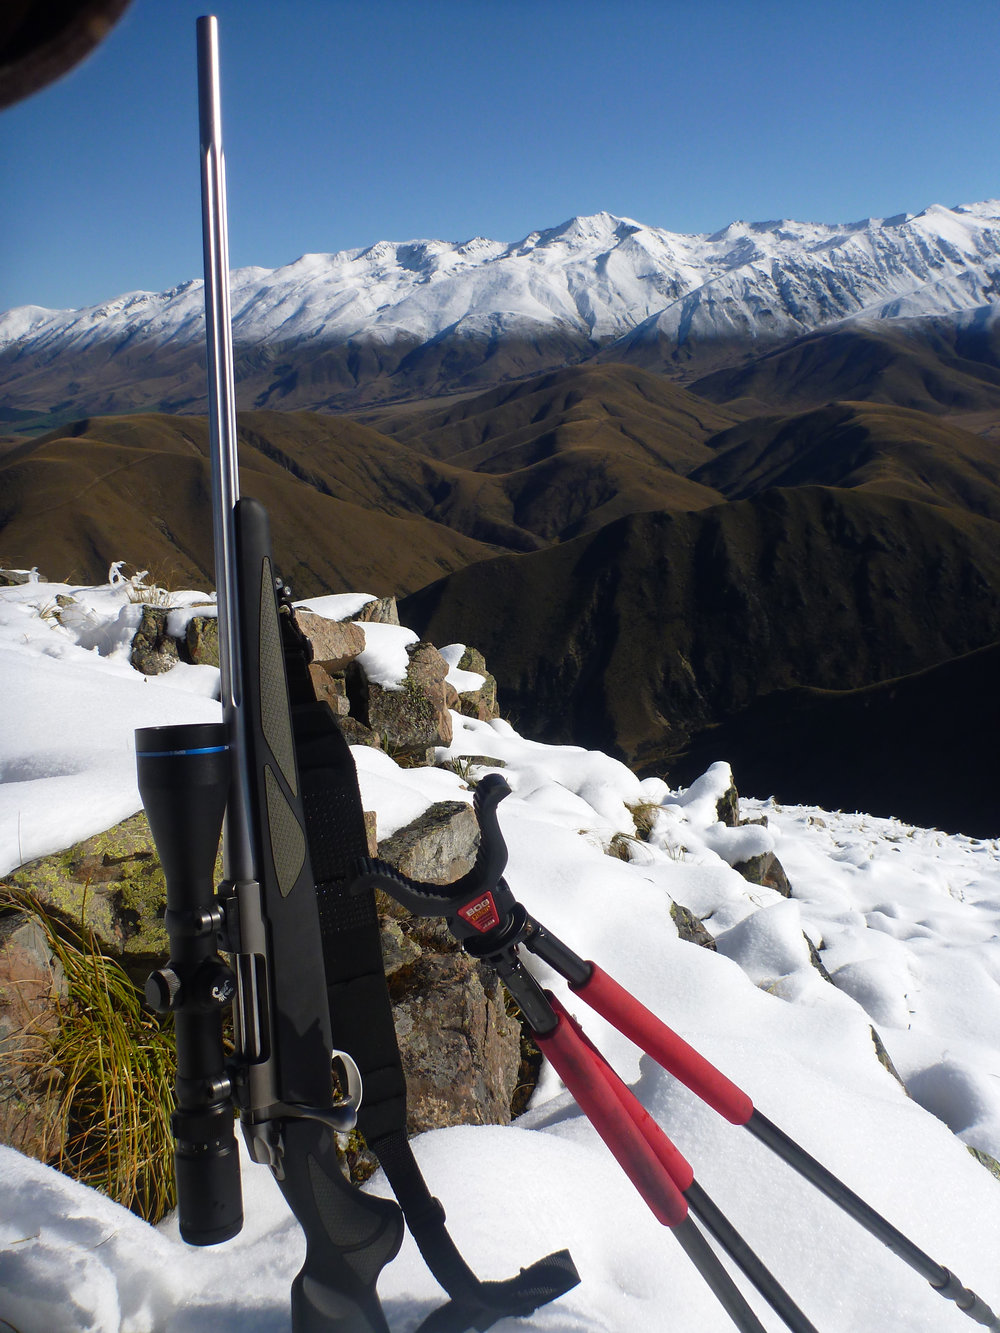 Great Tahr hunting rifle - Sako 7mm mag